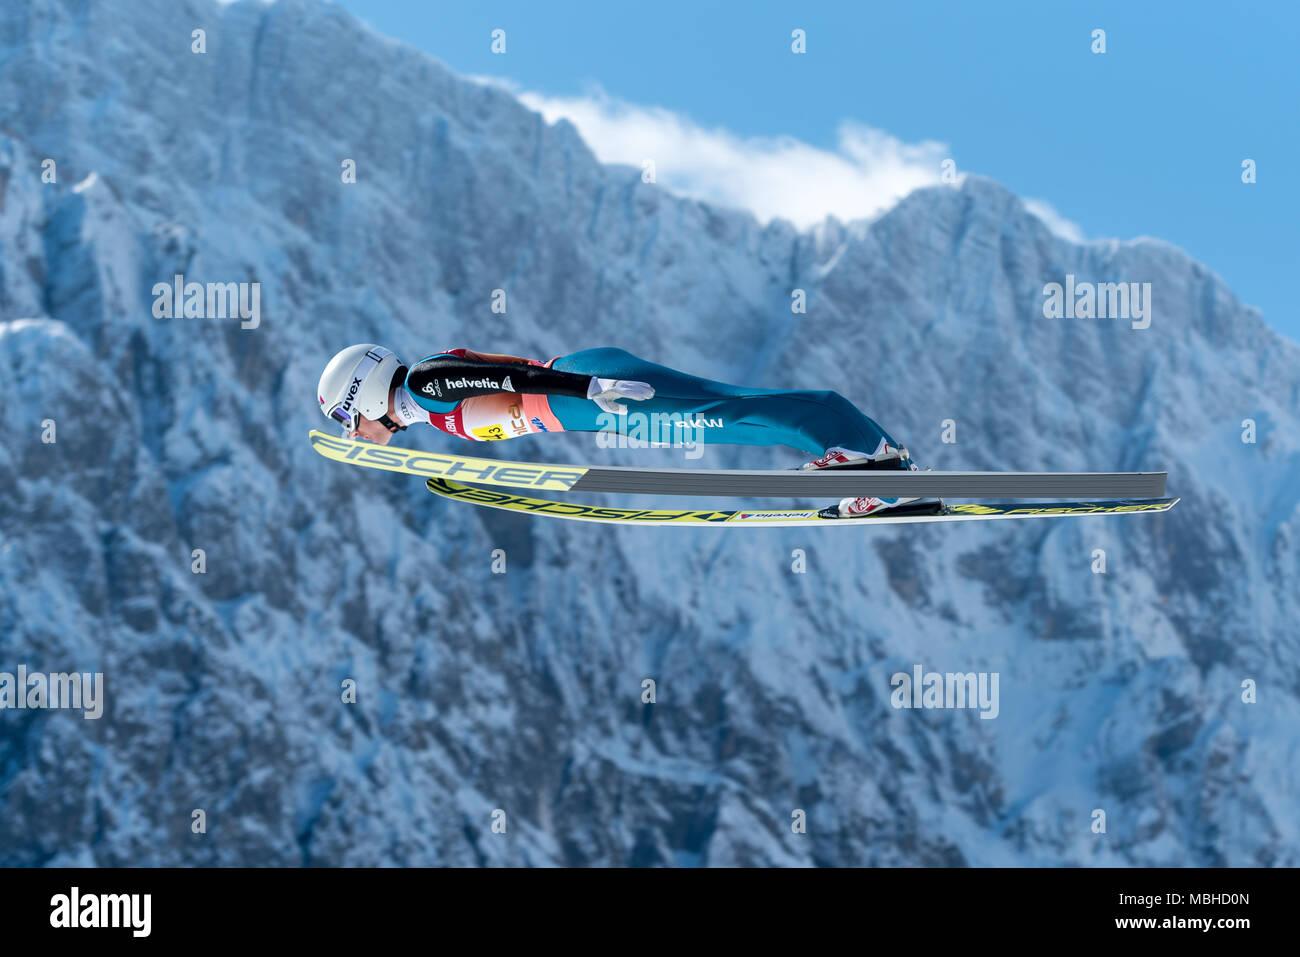 PLANICA, SLOVENIA - MARCH 24 2018 : Fis World Cup Ski Jumping Final - AMMANN Simon SUI - Stock Image